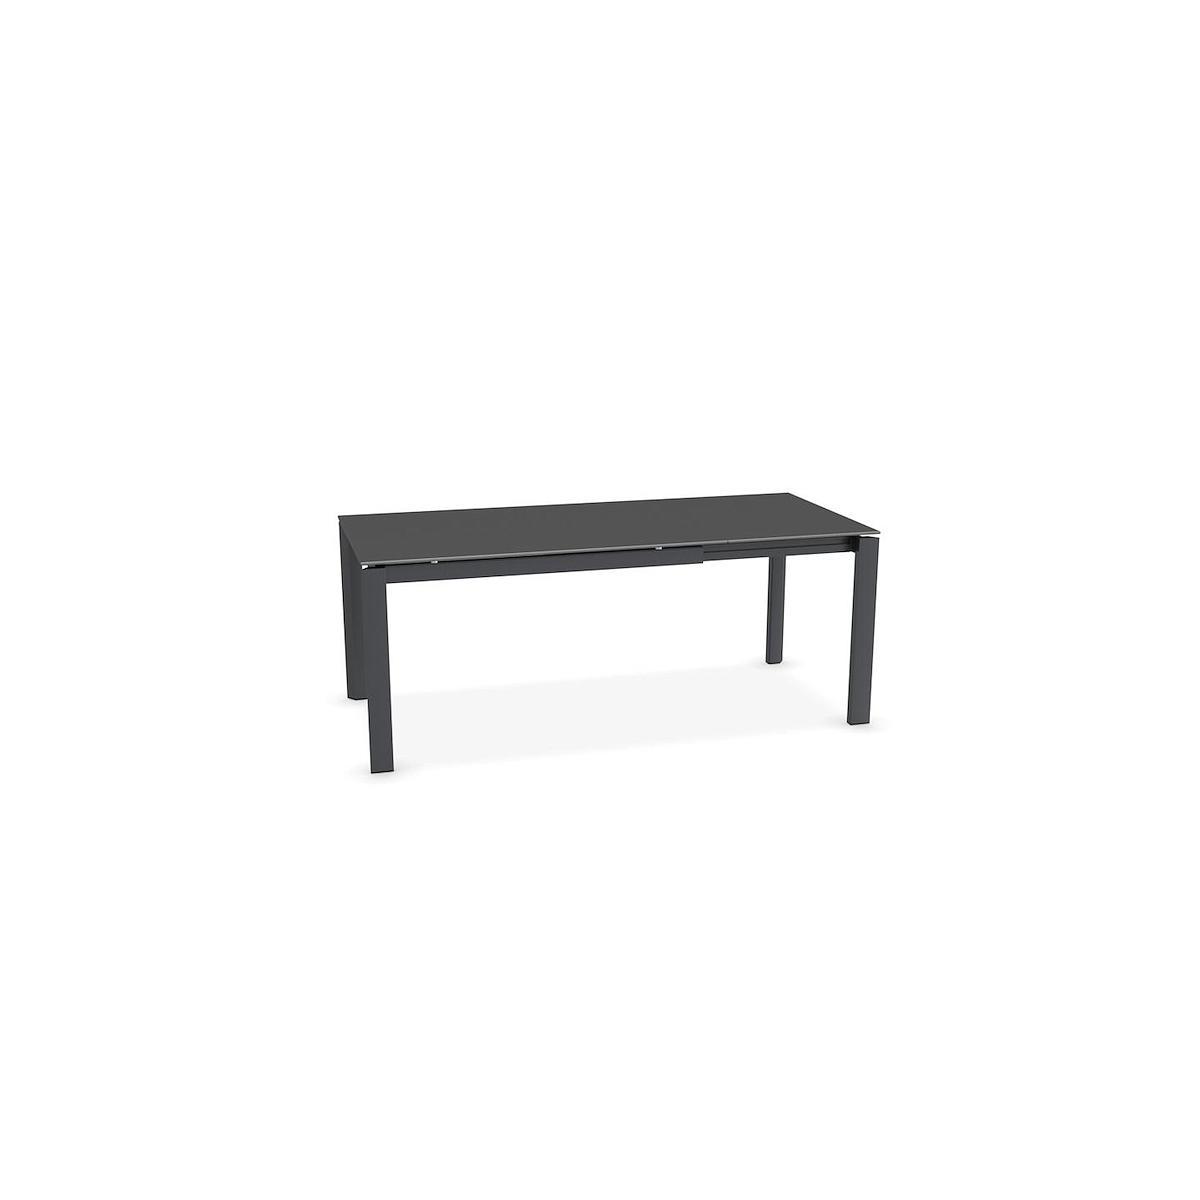 Table rectangulaire extensible DUCA Calligaris céramique-verre pierre